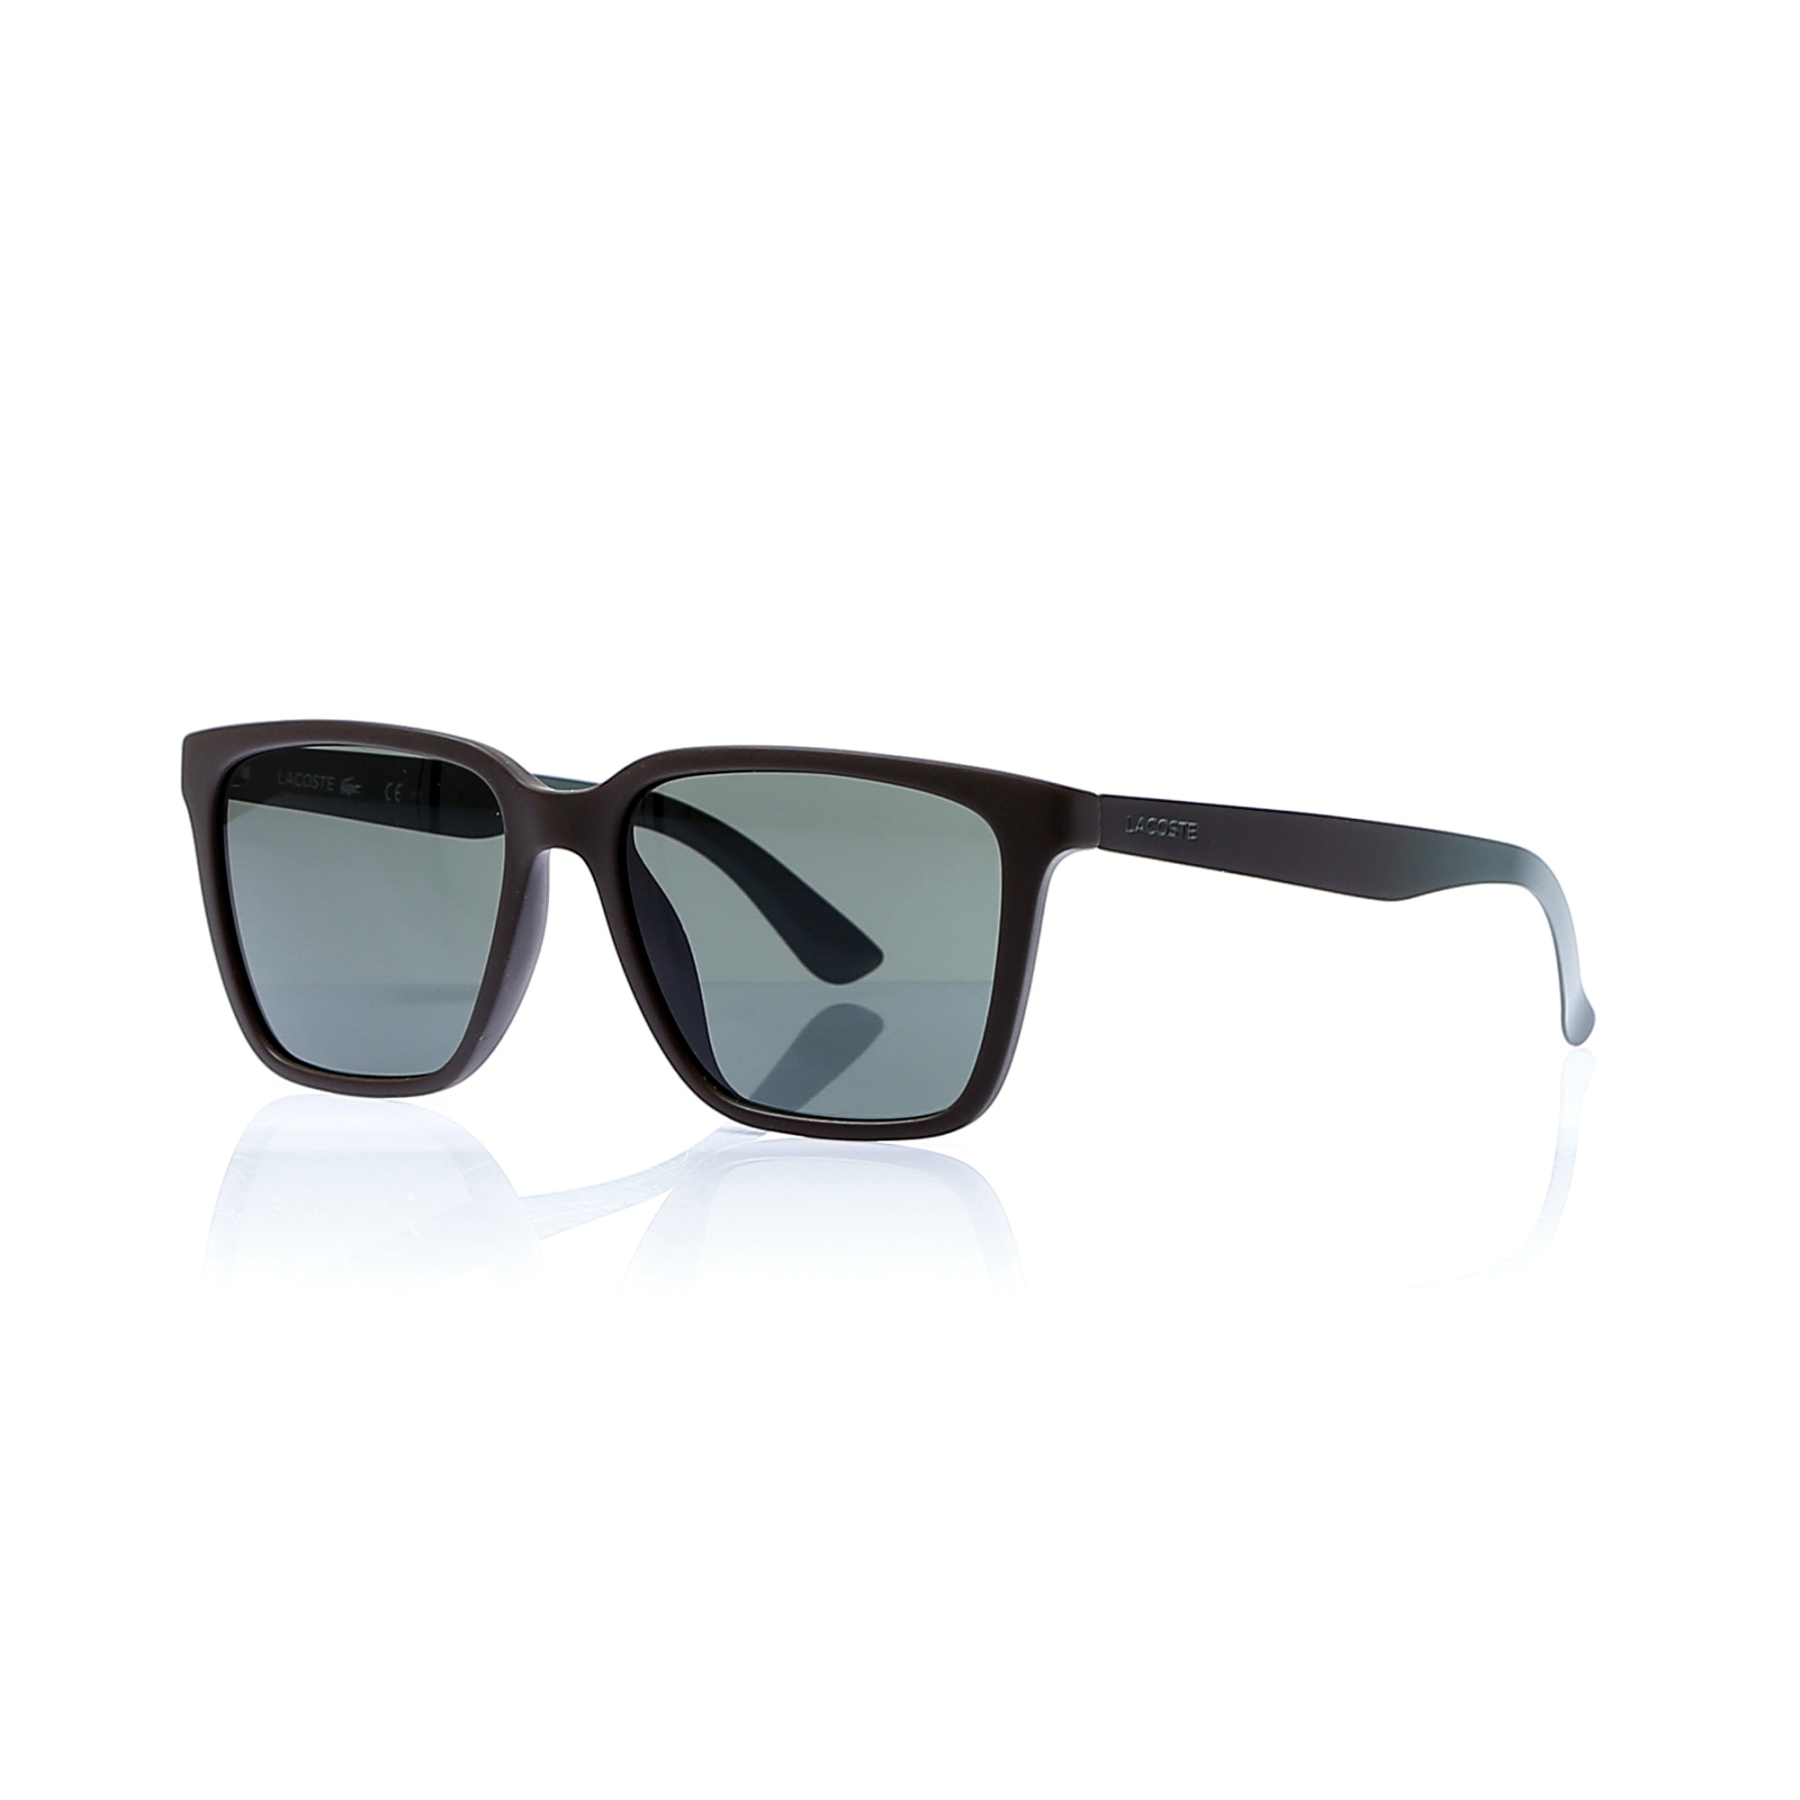 Unisex sunglasses lcc 795 210 bone Brown organic square square 54-16-140 lacoste